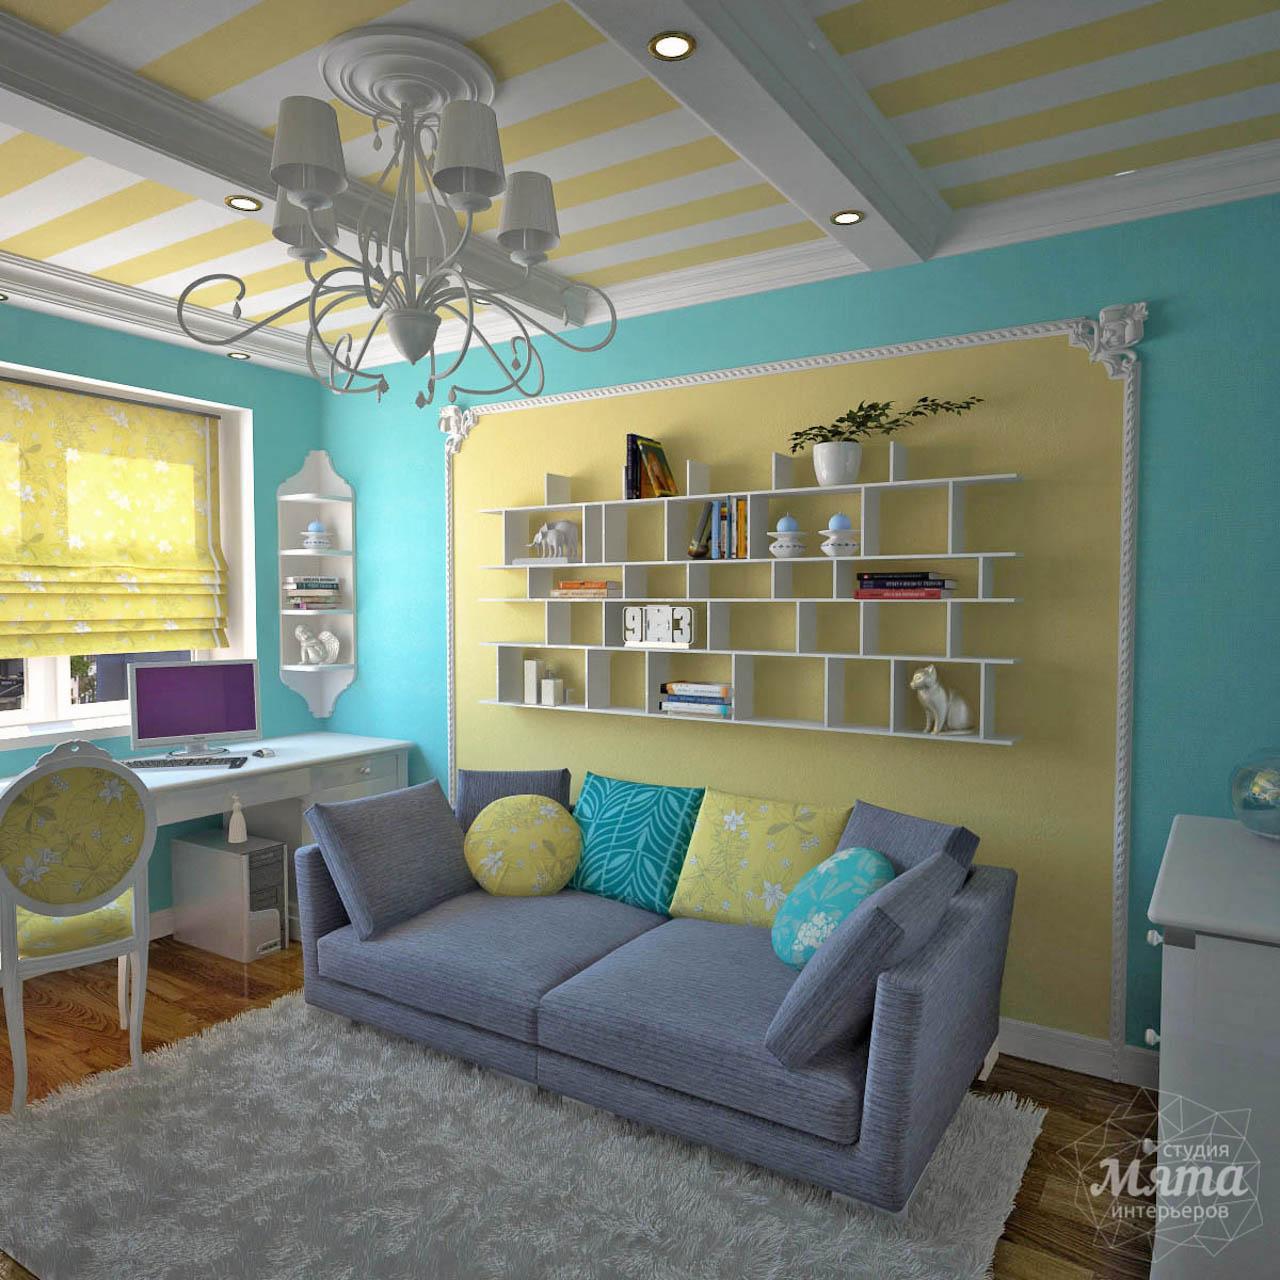 Дизайн интерьера двухкомнатной квартиры по ул. Комсомольская 14 img1124628962